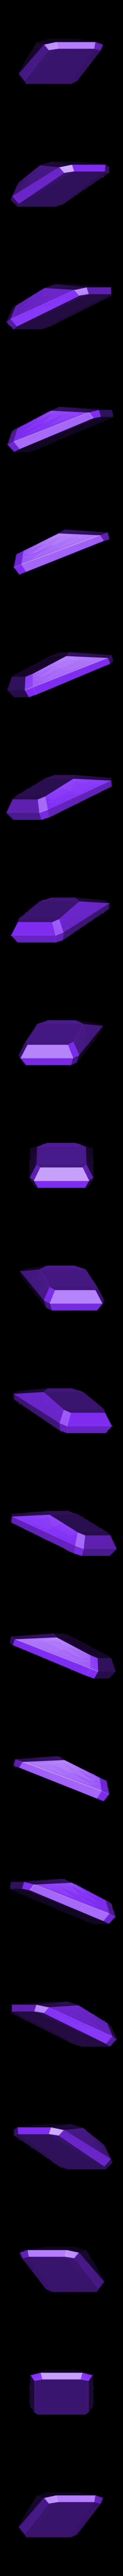 Lucio_button.stl Download free STL file Overwatch Lucio Blaster • 3D printer object, Adafruit